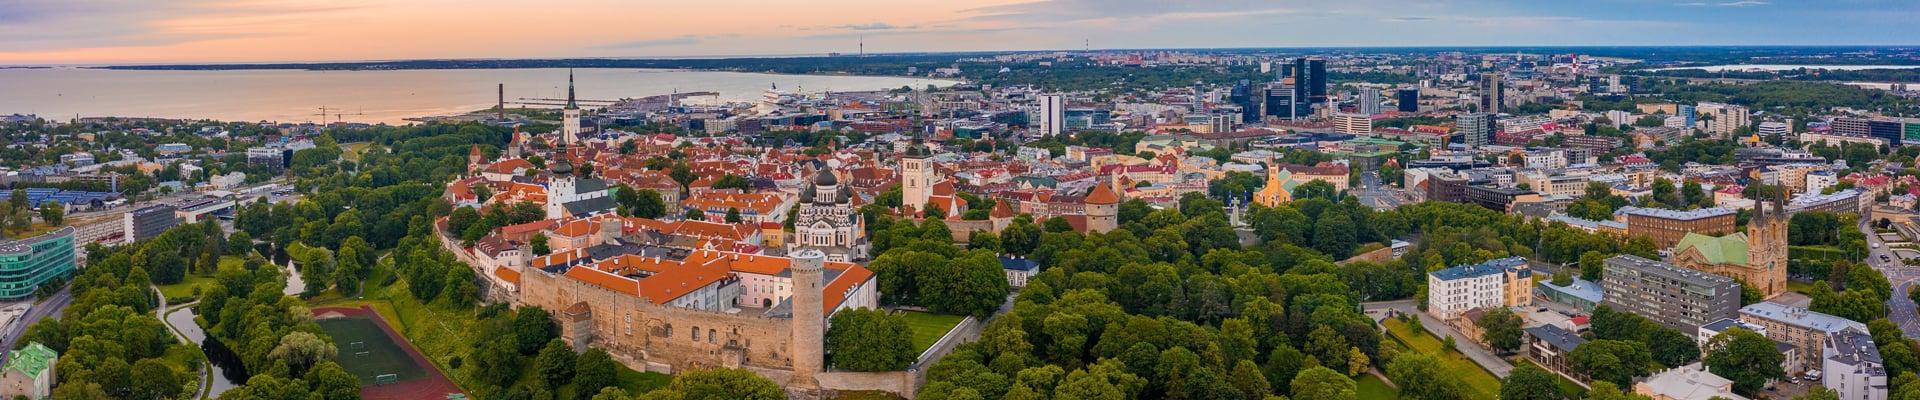 Aerial View of Old Town Tallinn, Estonia